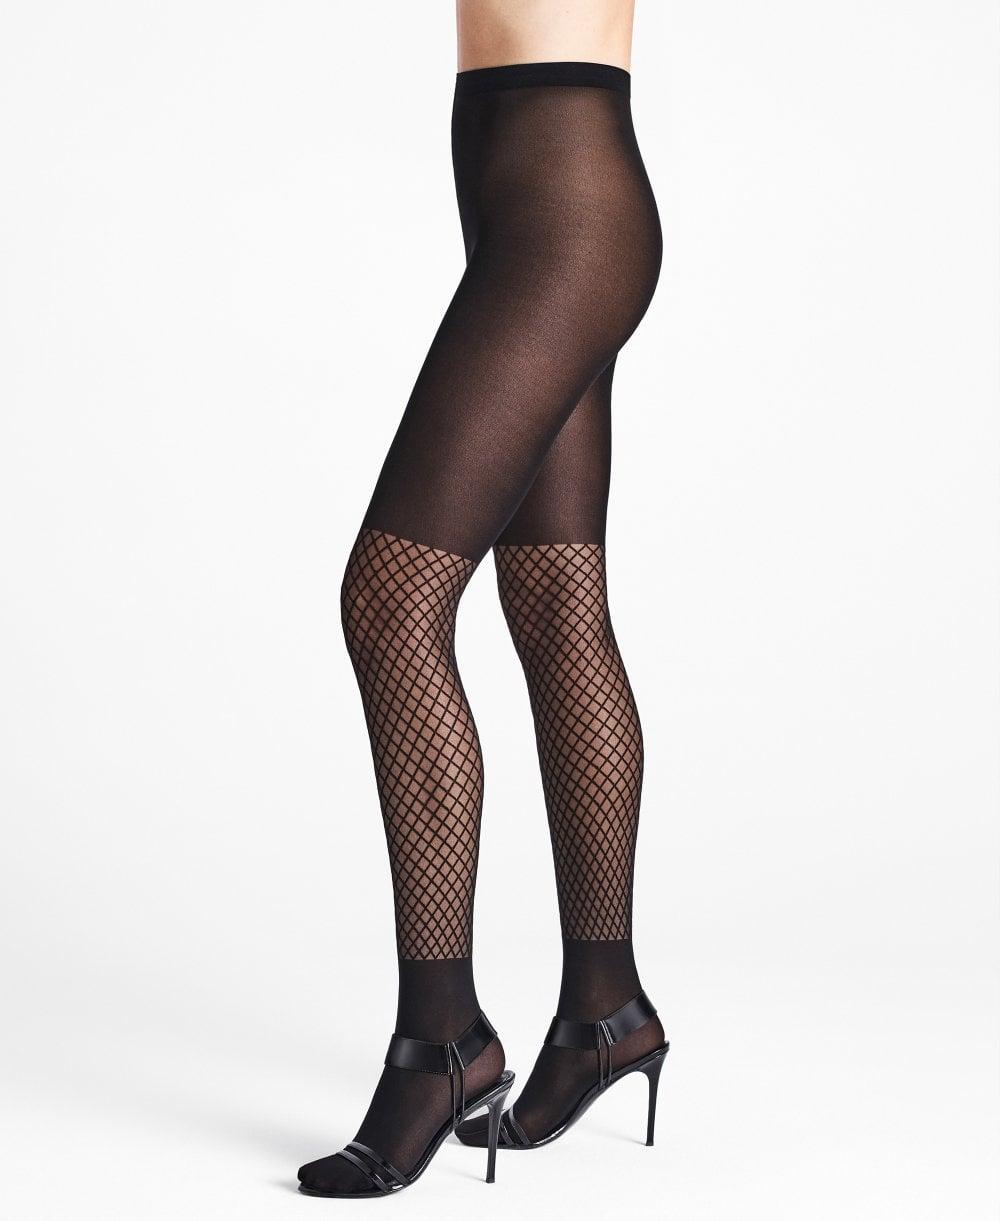 7f5373b689b Wolford Intense Net Tights - Tights from luxury-legs.com UK